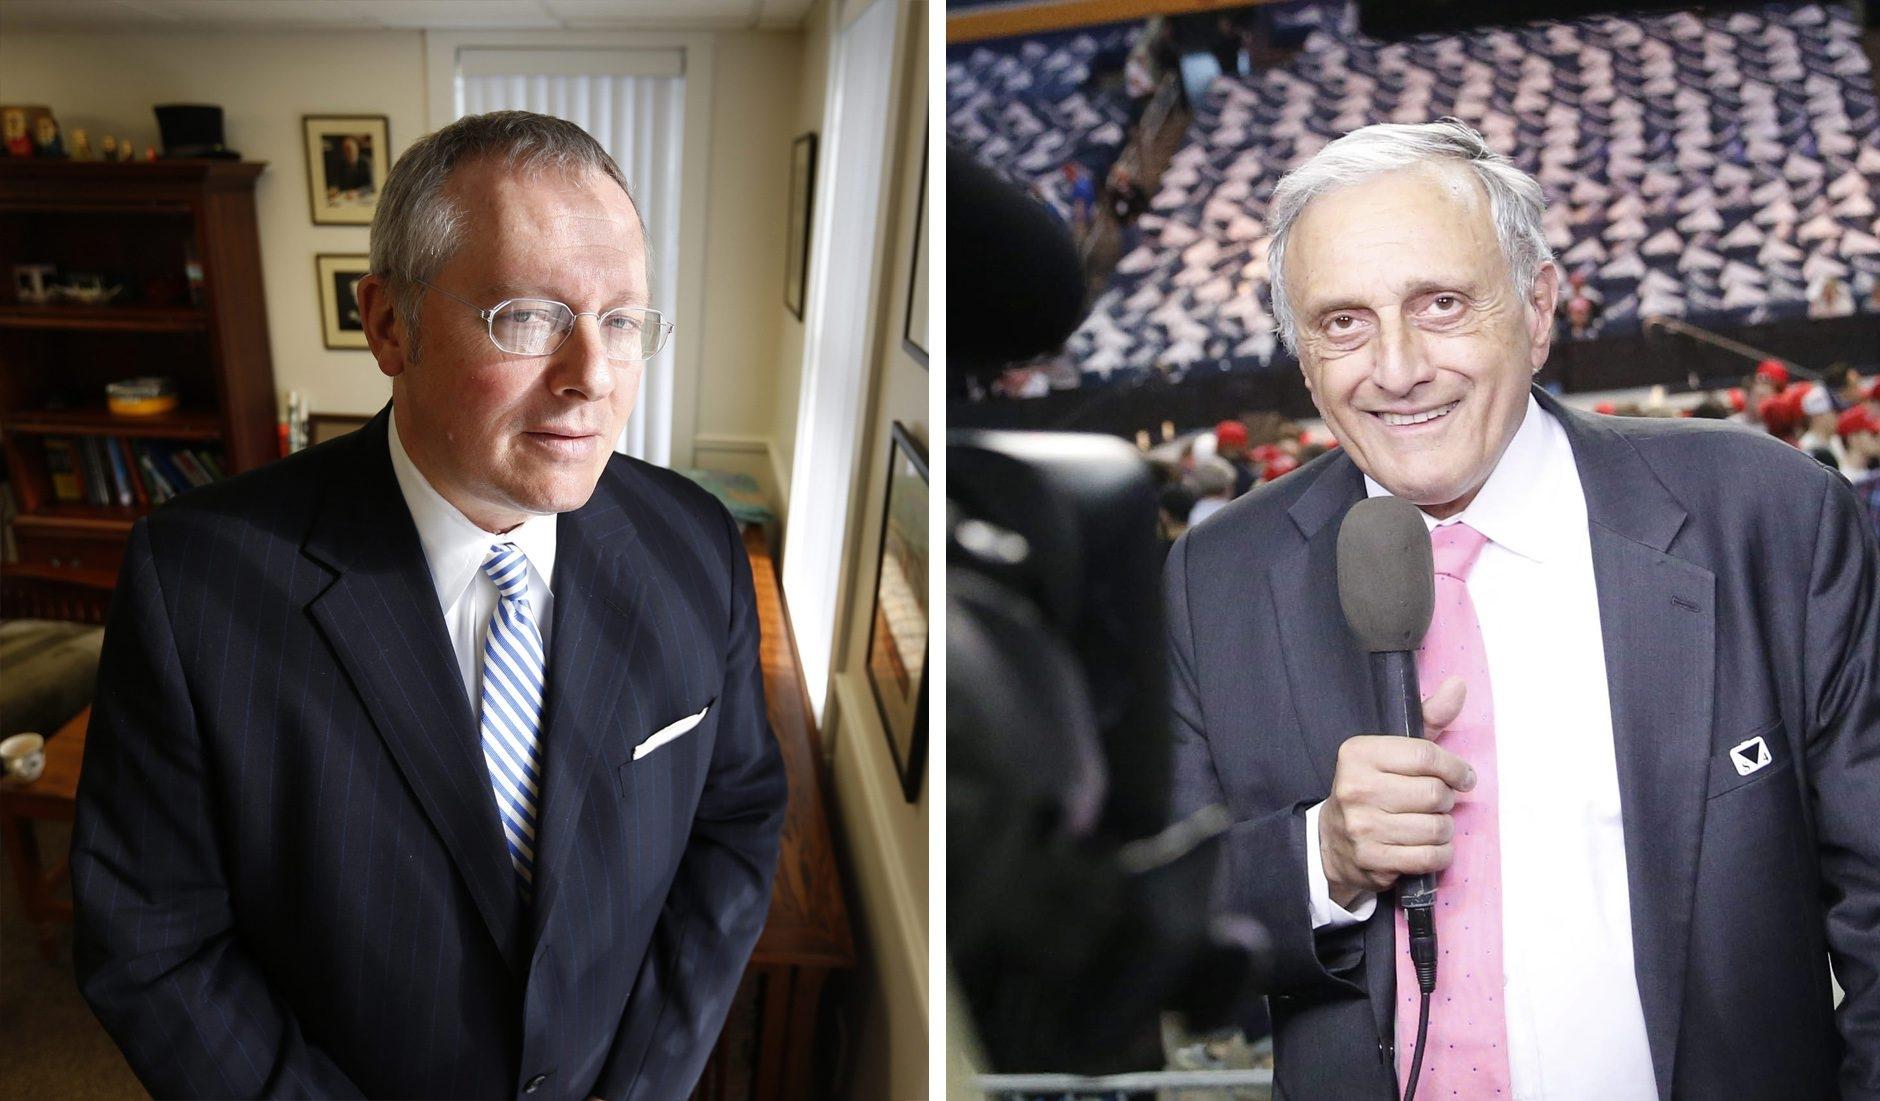 Michael Caputo, left, managed the 2010 gubernatorial campaign of Carl Paladino, right. (News file photos)